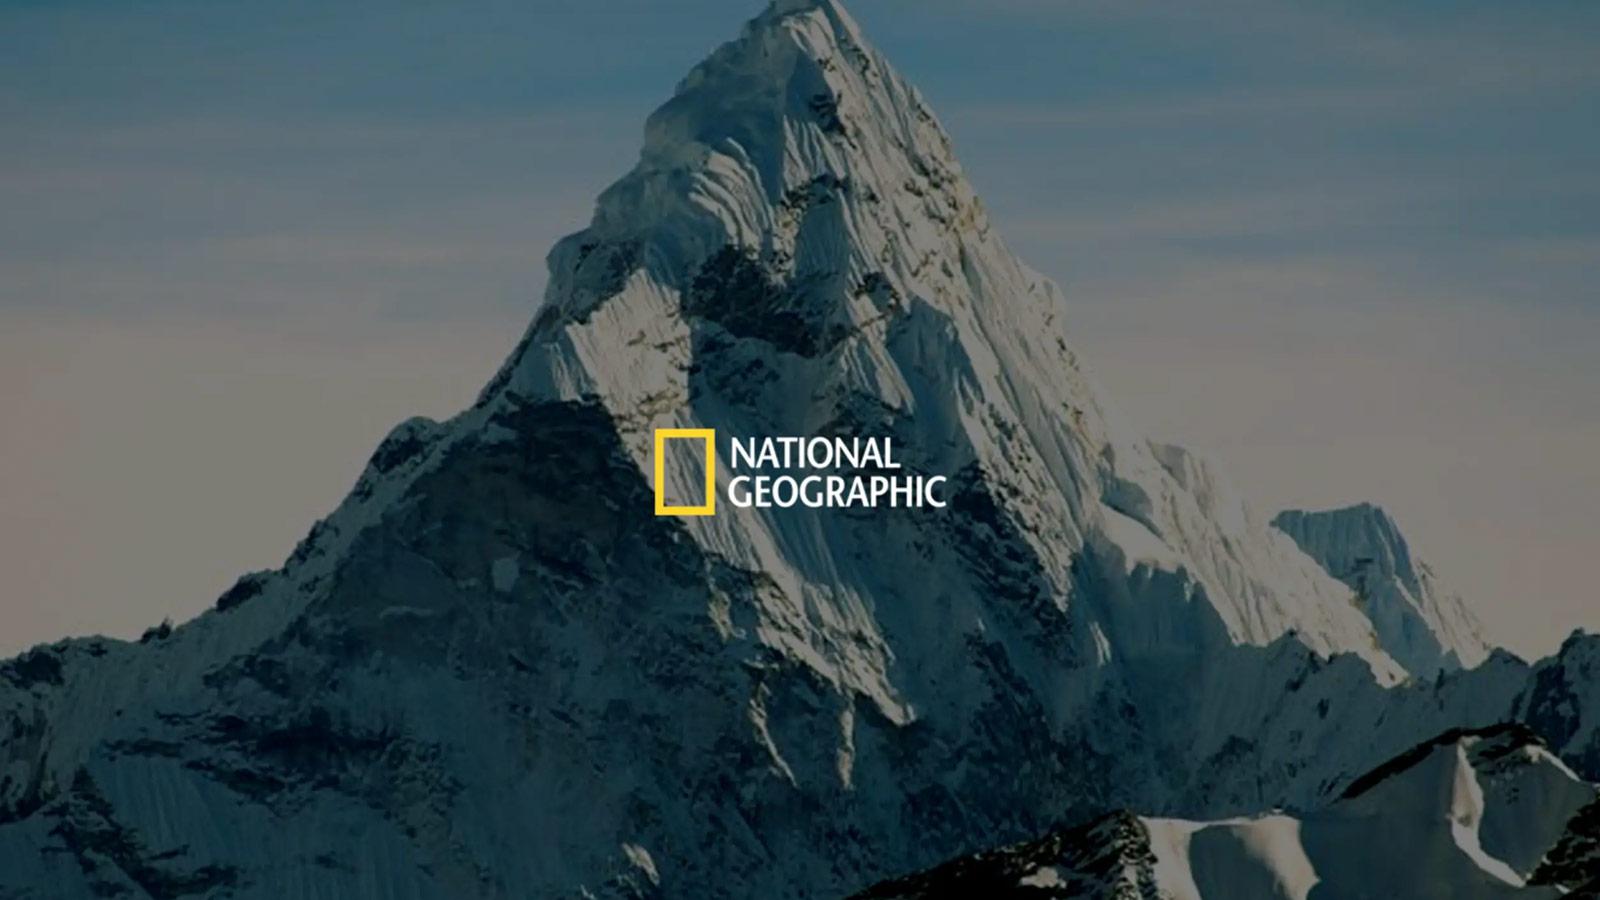 "Mission Everest - Documentary for NatGeo Abu Dhabi    mission-everest-documentary-for-natgeo-abu-dhabi"">WATCH"